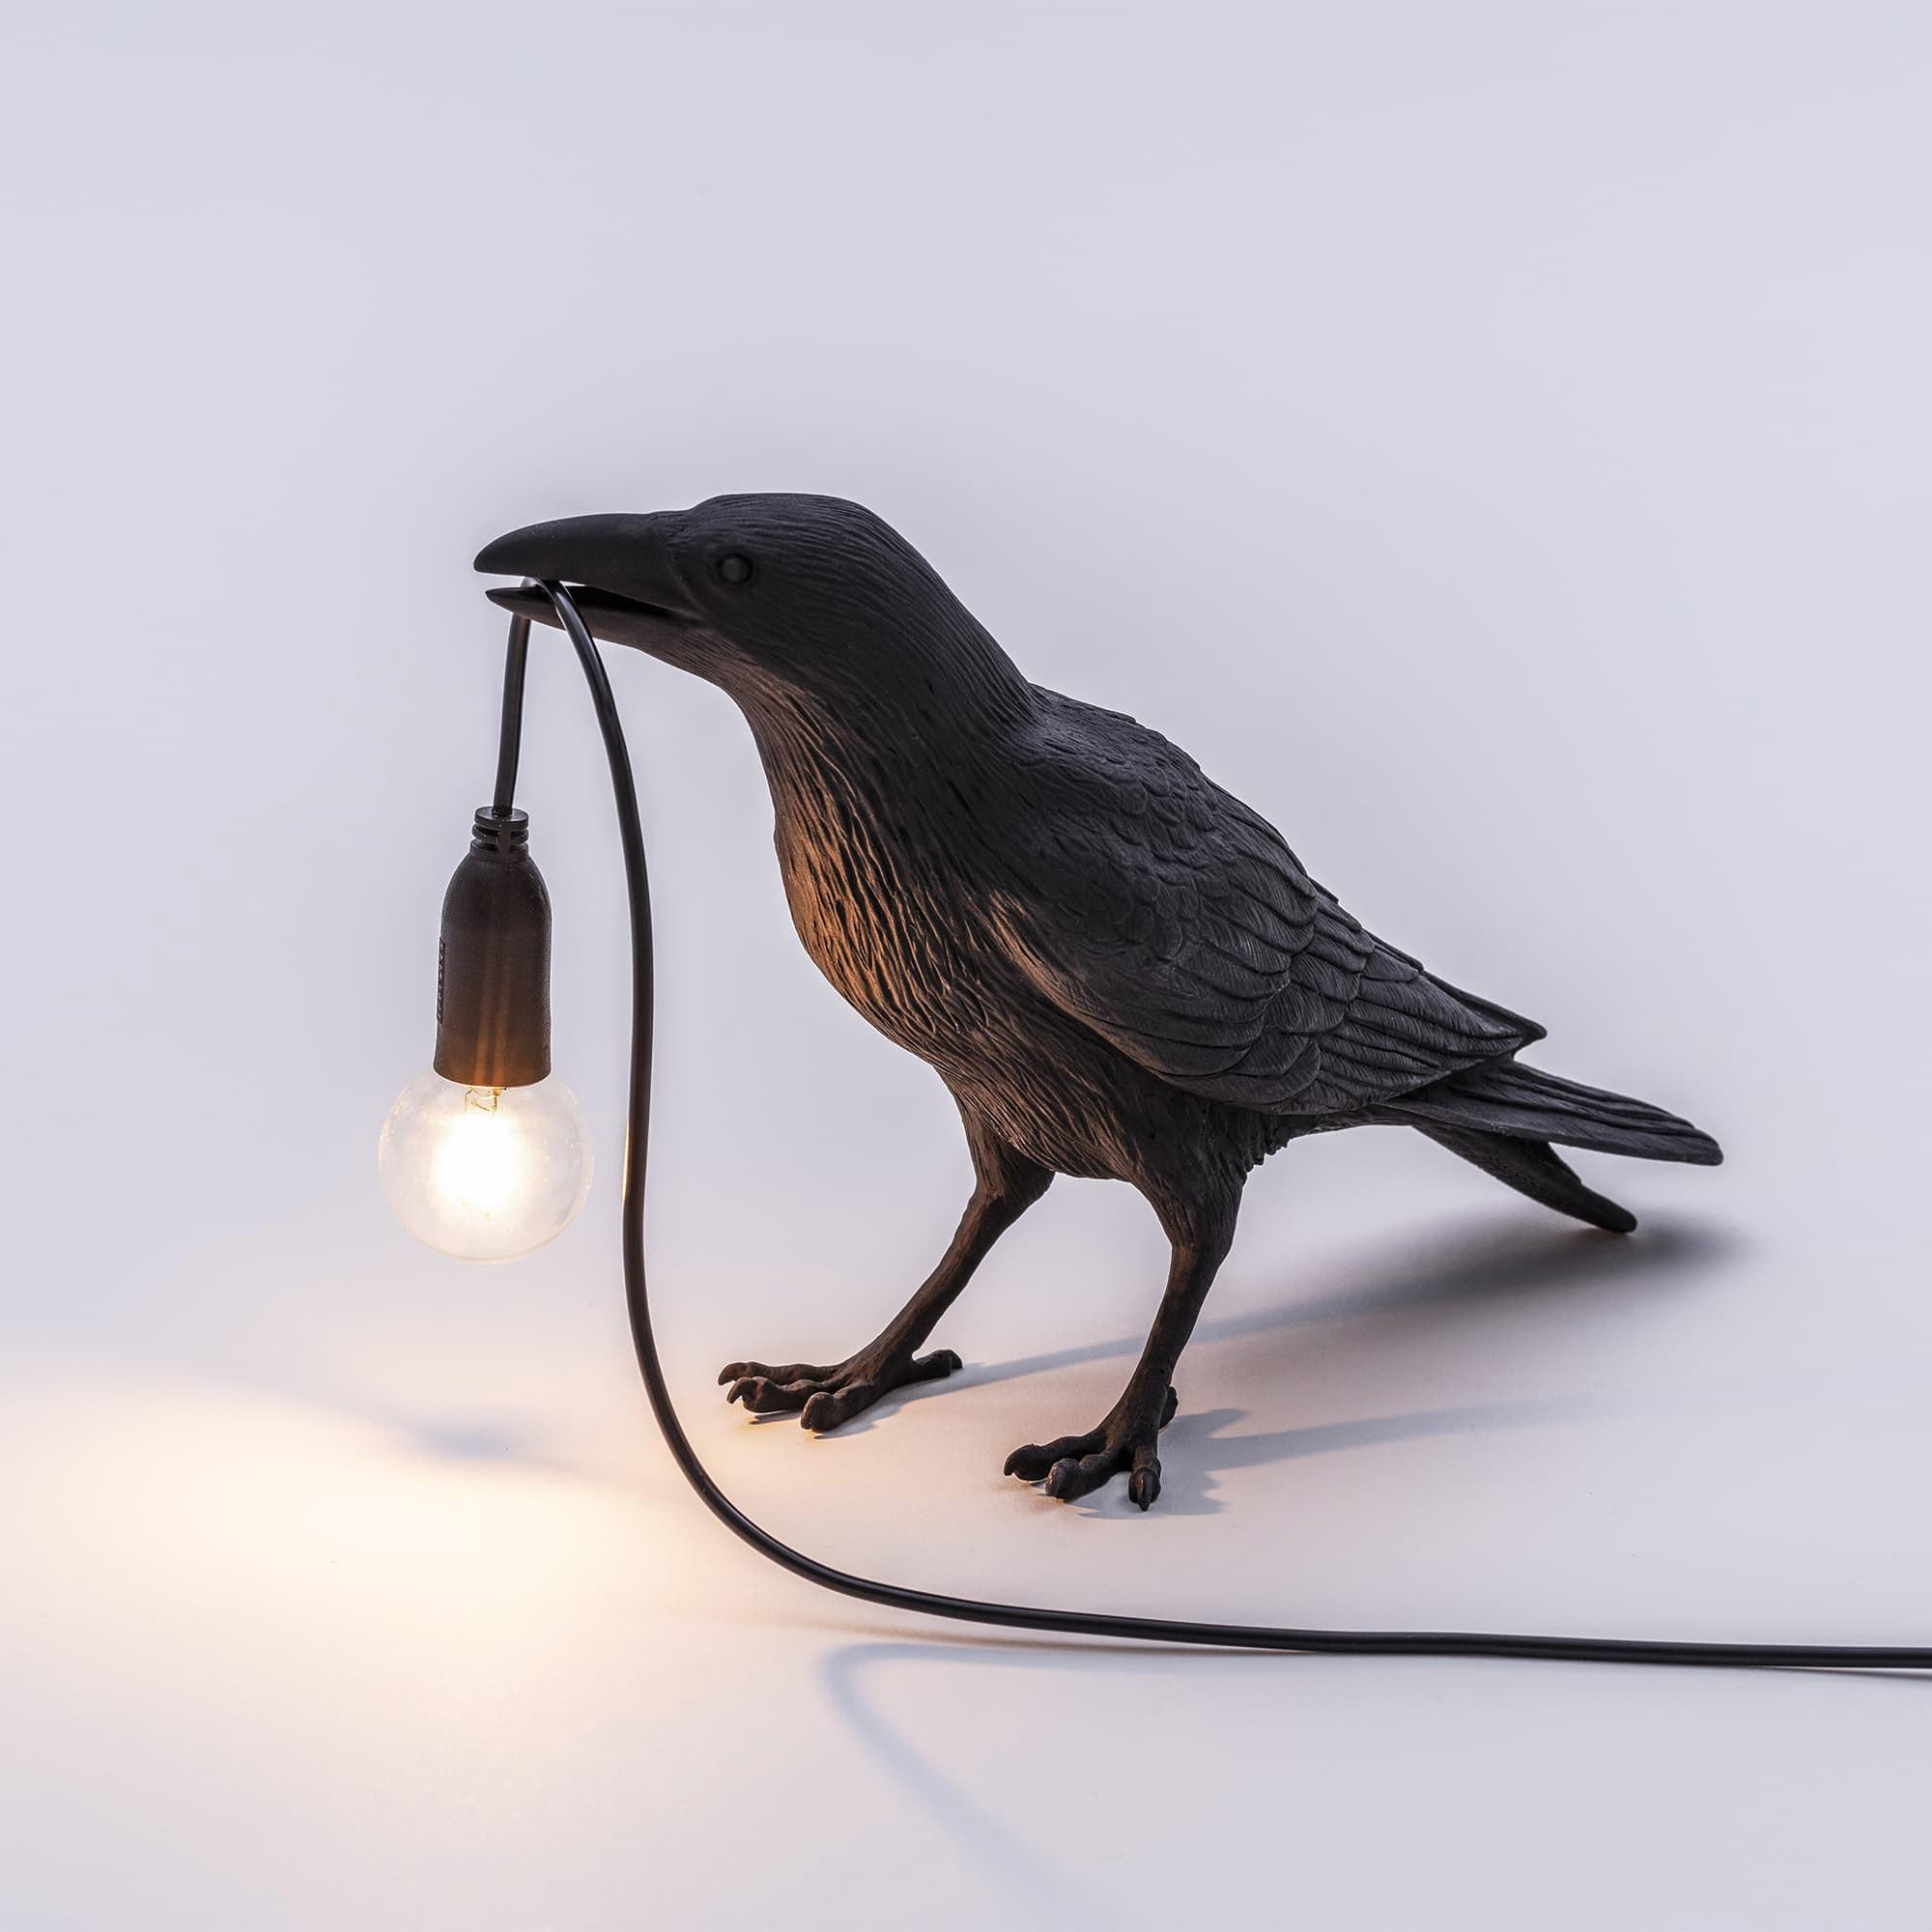 Resin Seletti Bird Lamp LED Table Lamps Wall Lamp Desk Lamp For Living Room Bedroom Light Fixtures Wall Sconce Home Art Decor